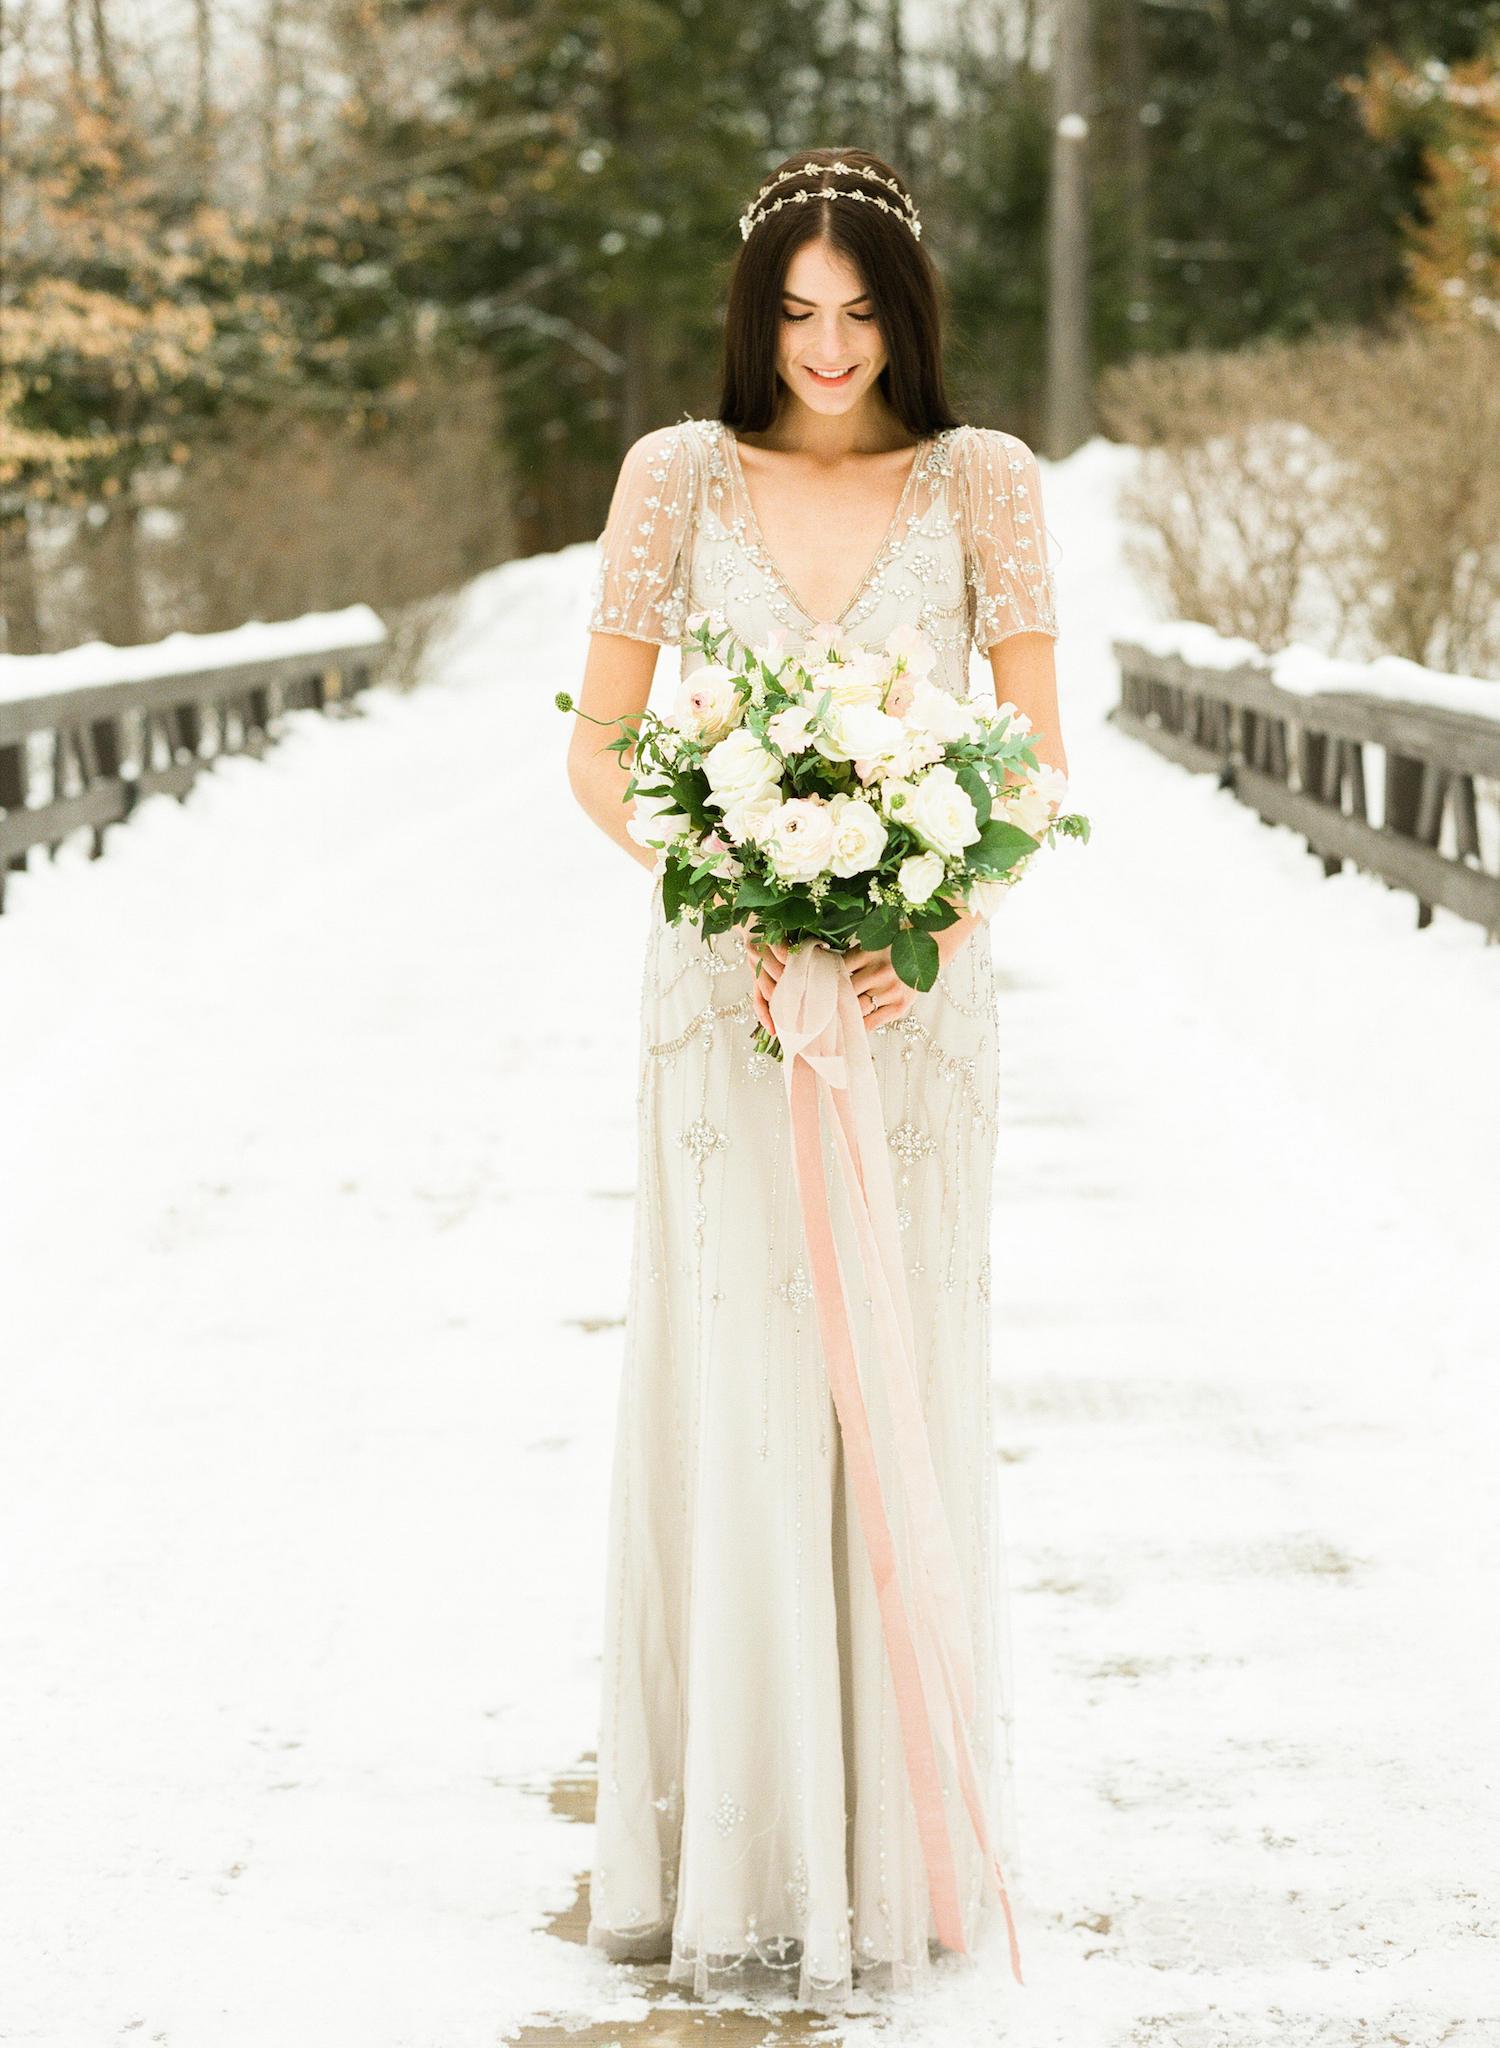 Winter Editorial-JennyPackham-LindsayMaddenPhotography-16 copy.jpg